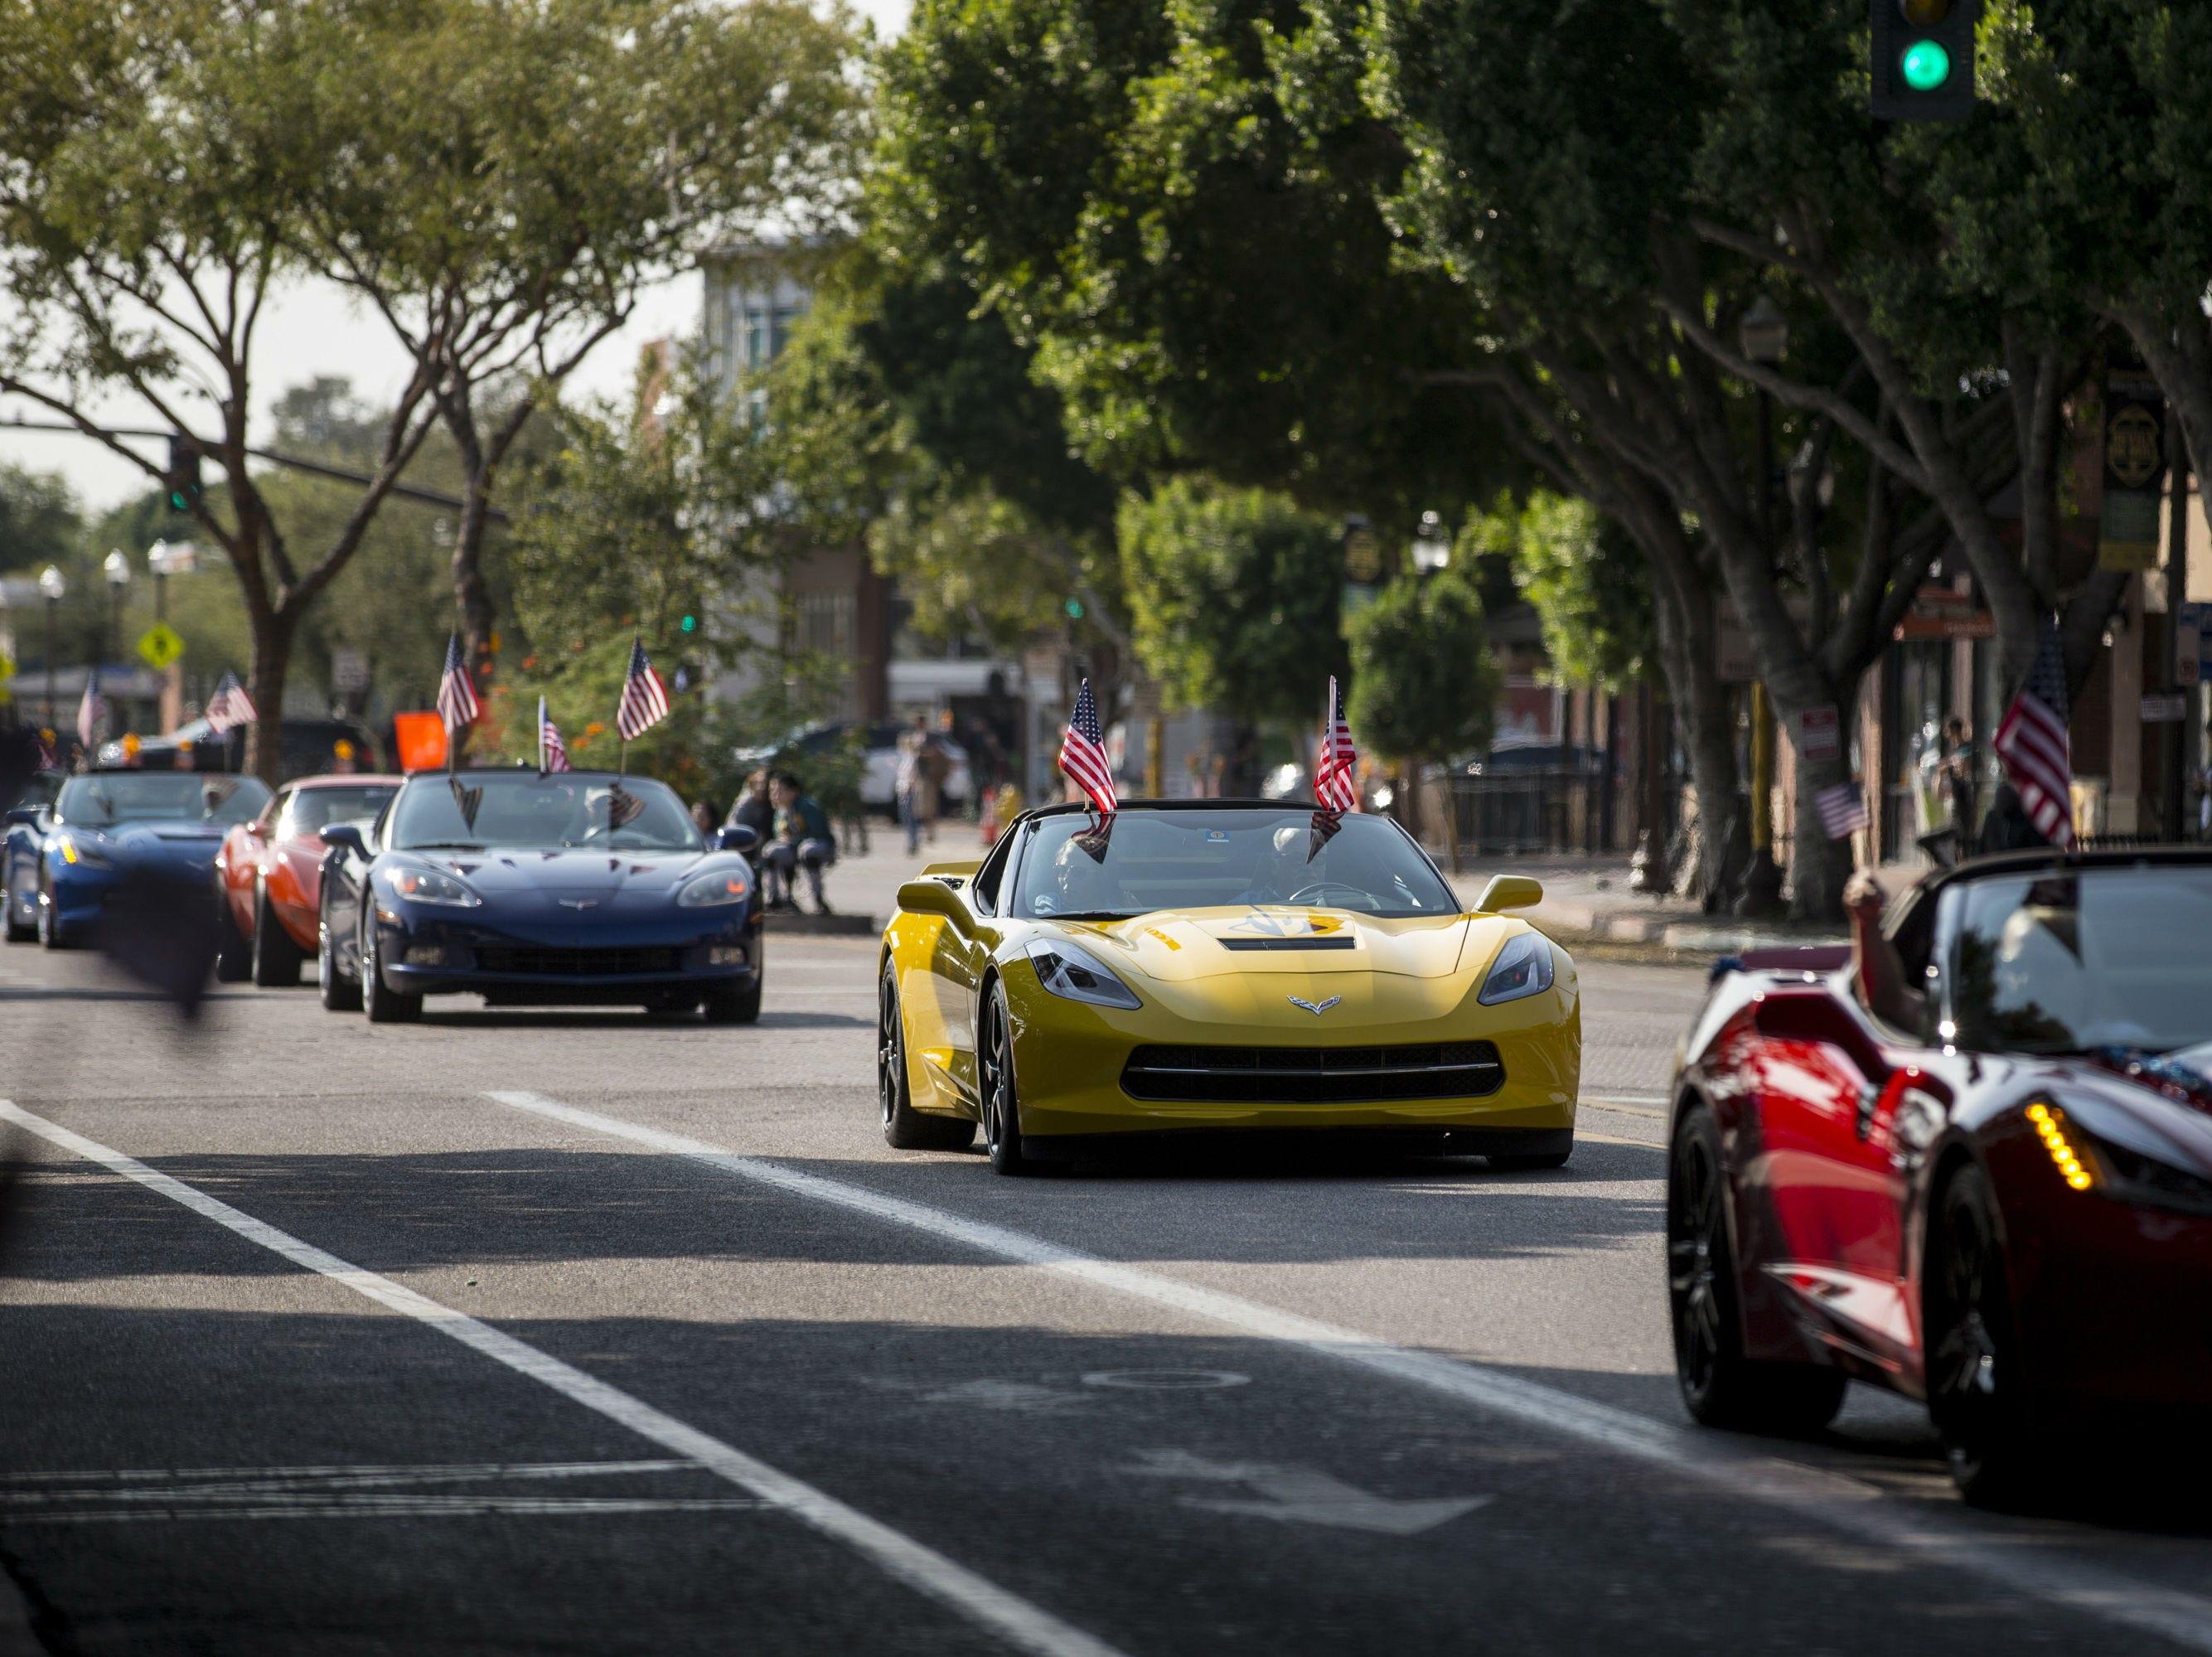 Corvettes drive down Mill Avenue during the Veterans Day Parade on Nov. 11, 2018, in Tempe, Ariz.